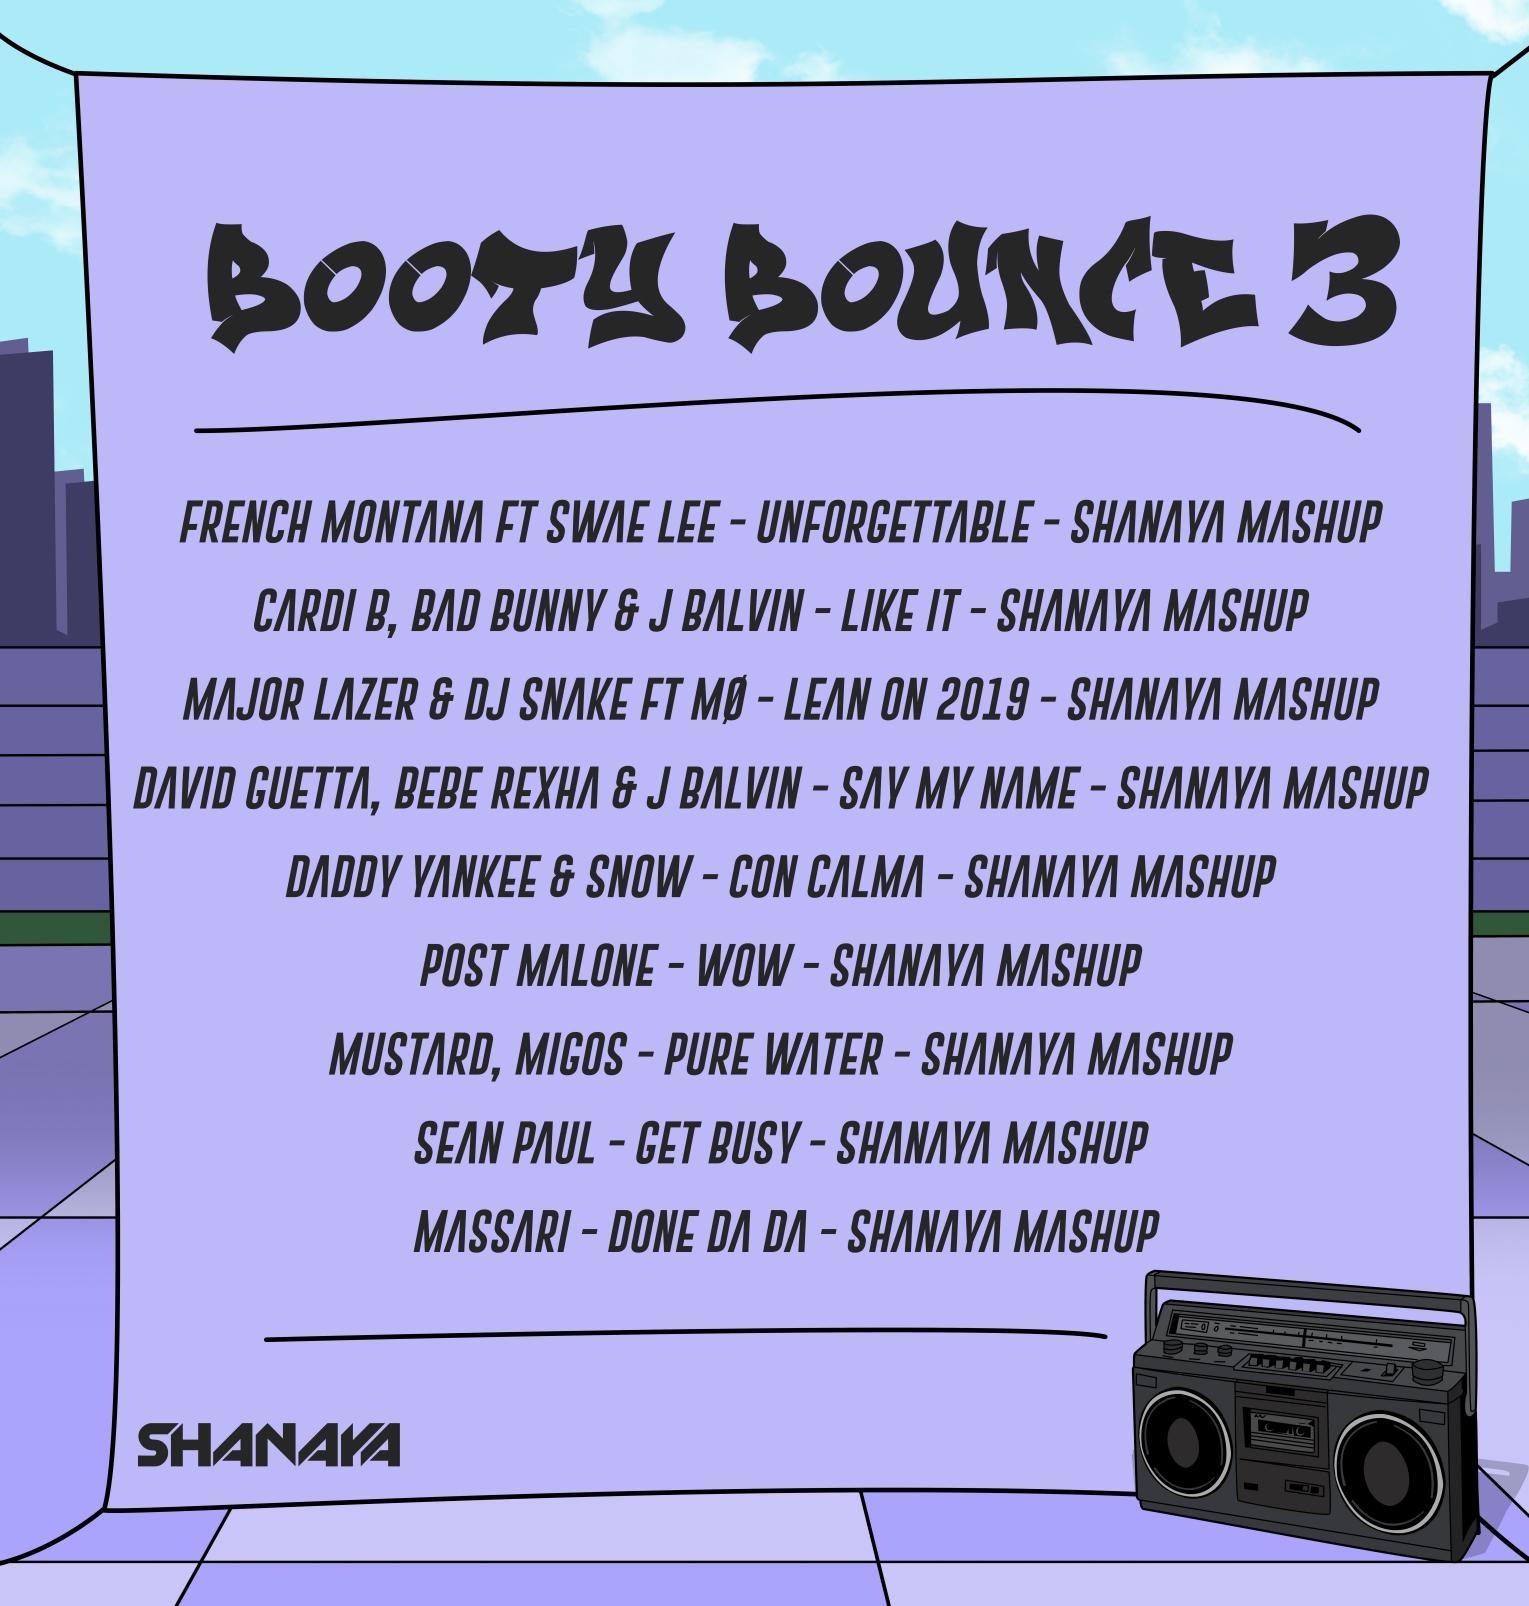 Booty Bounce 3 Tracklist - Shanaya